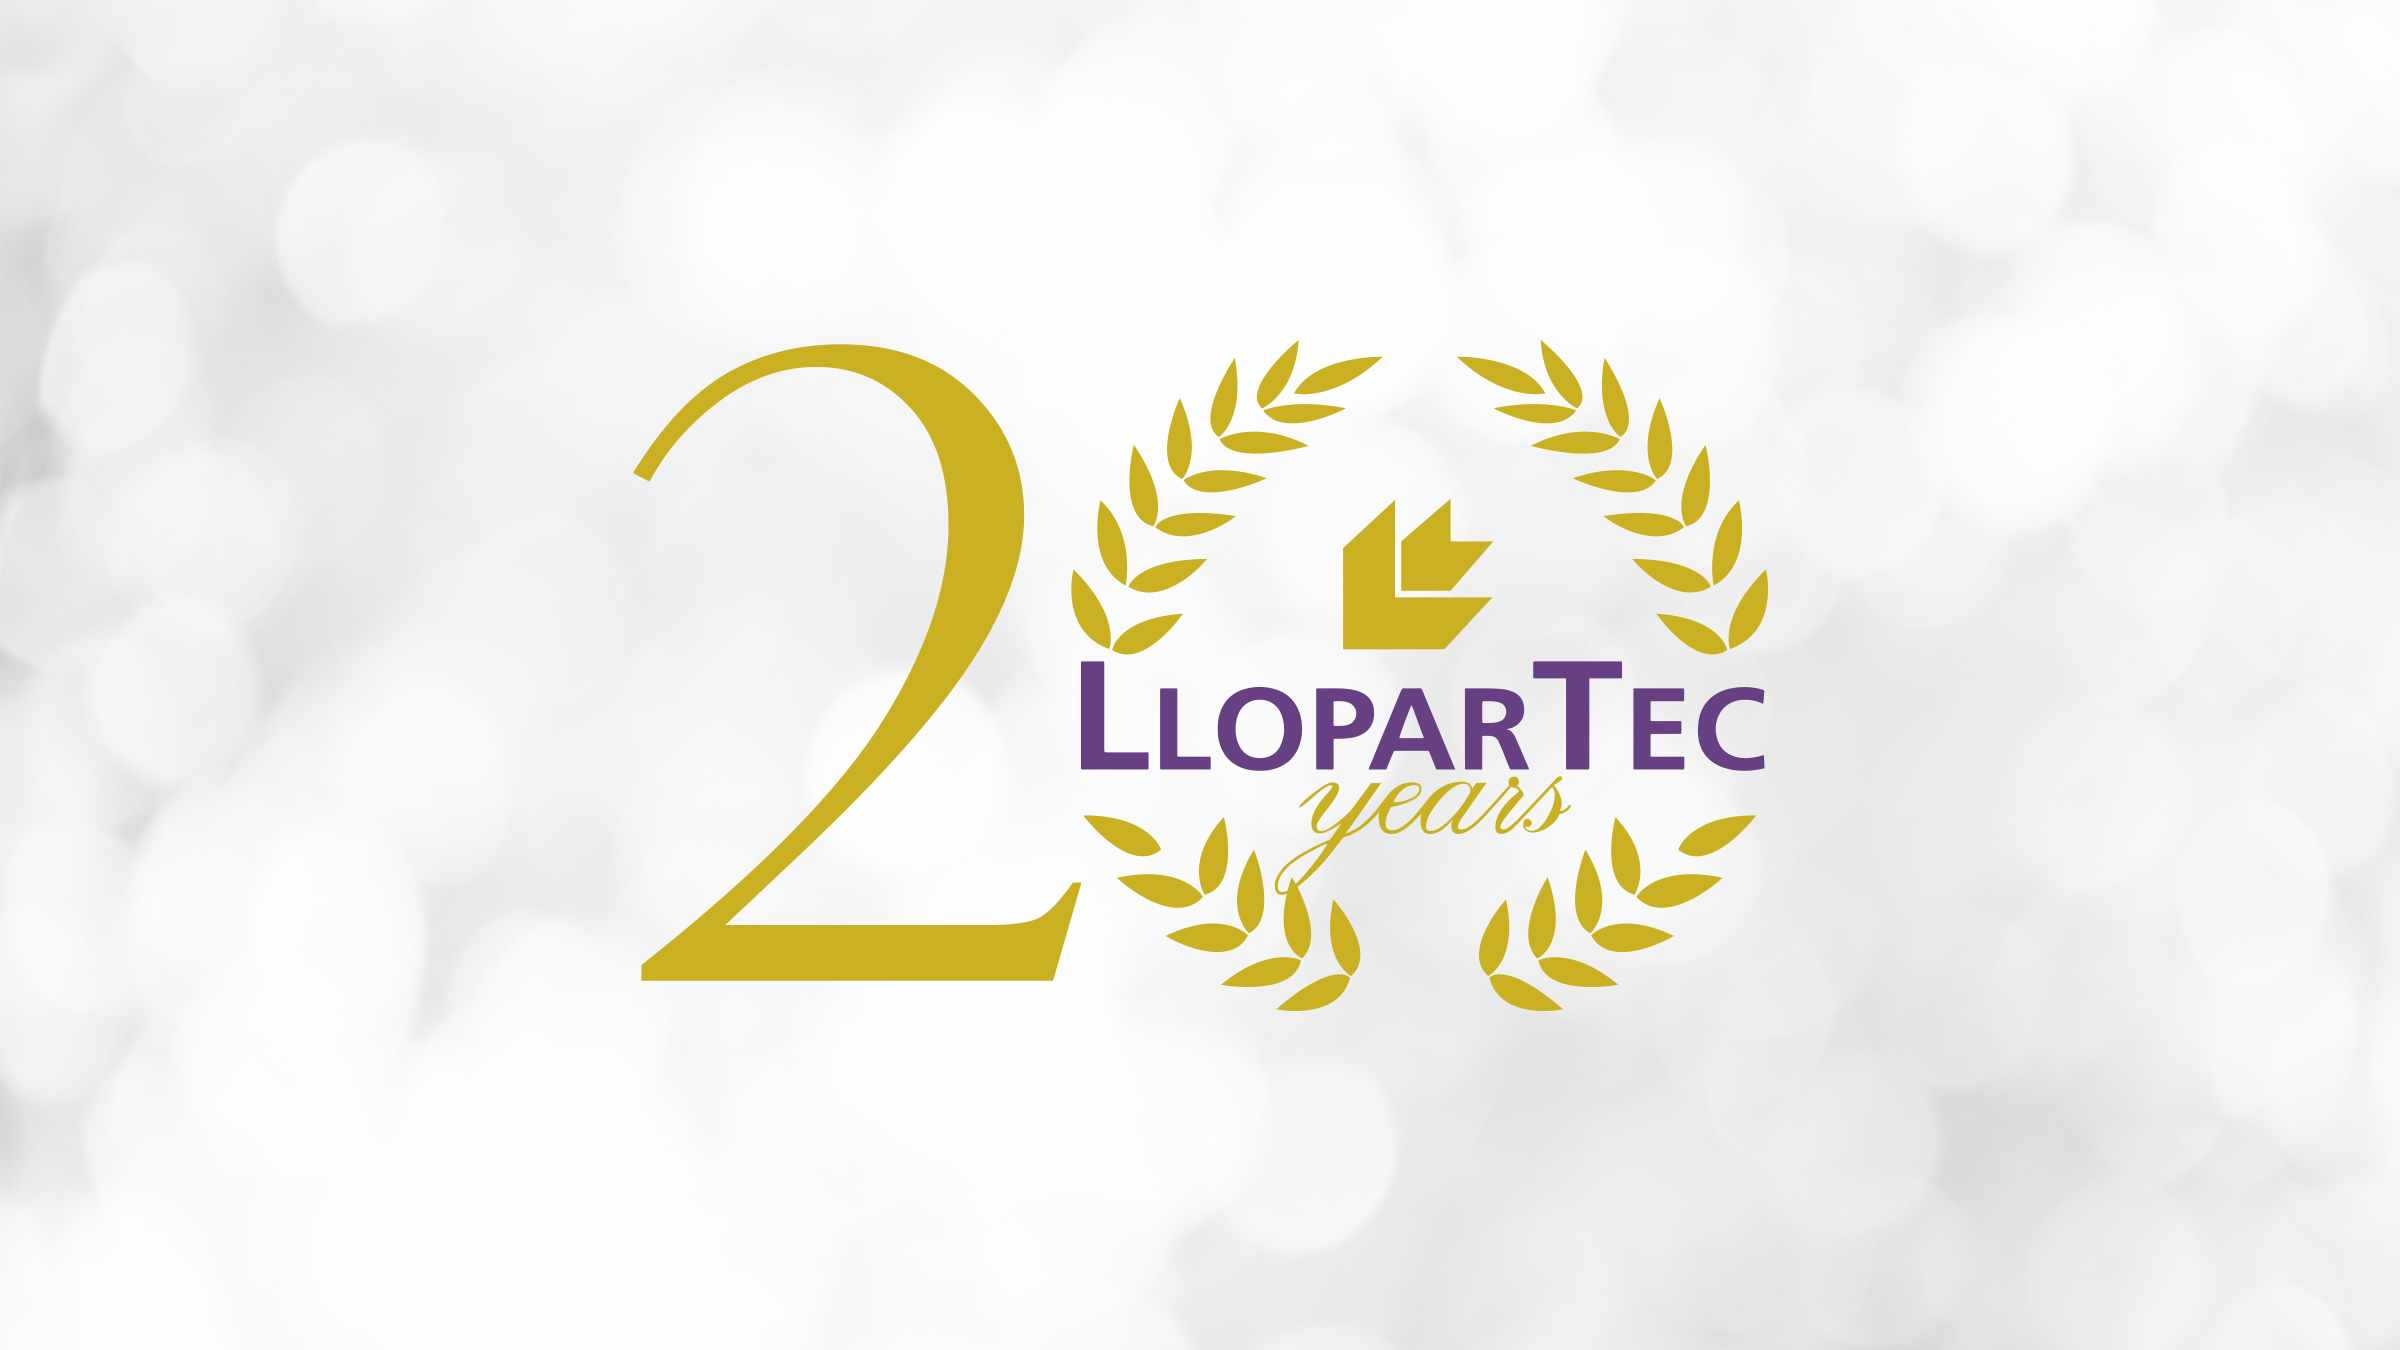 Llopartec anniversary